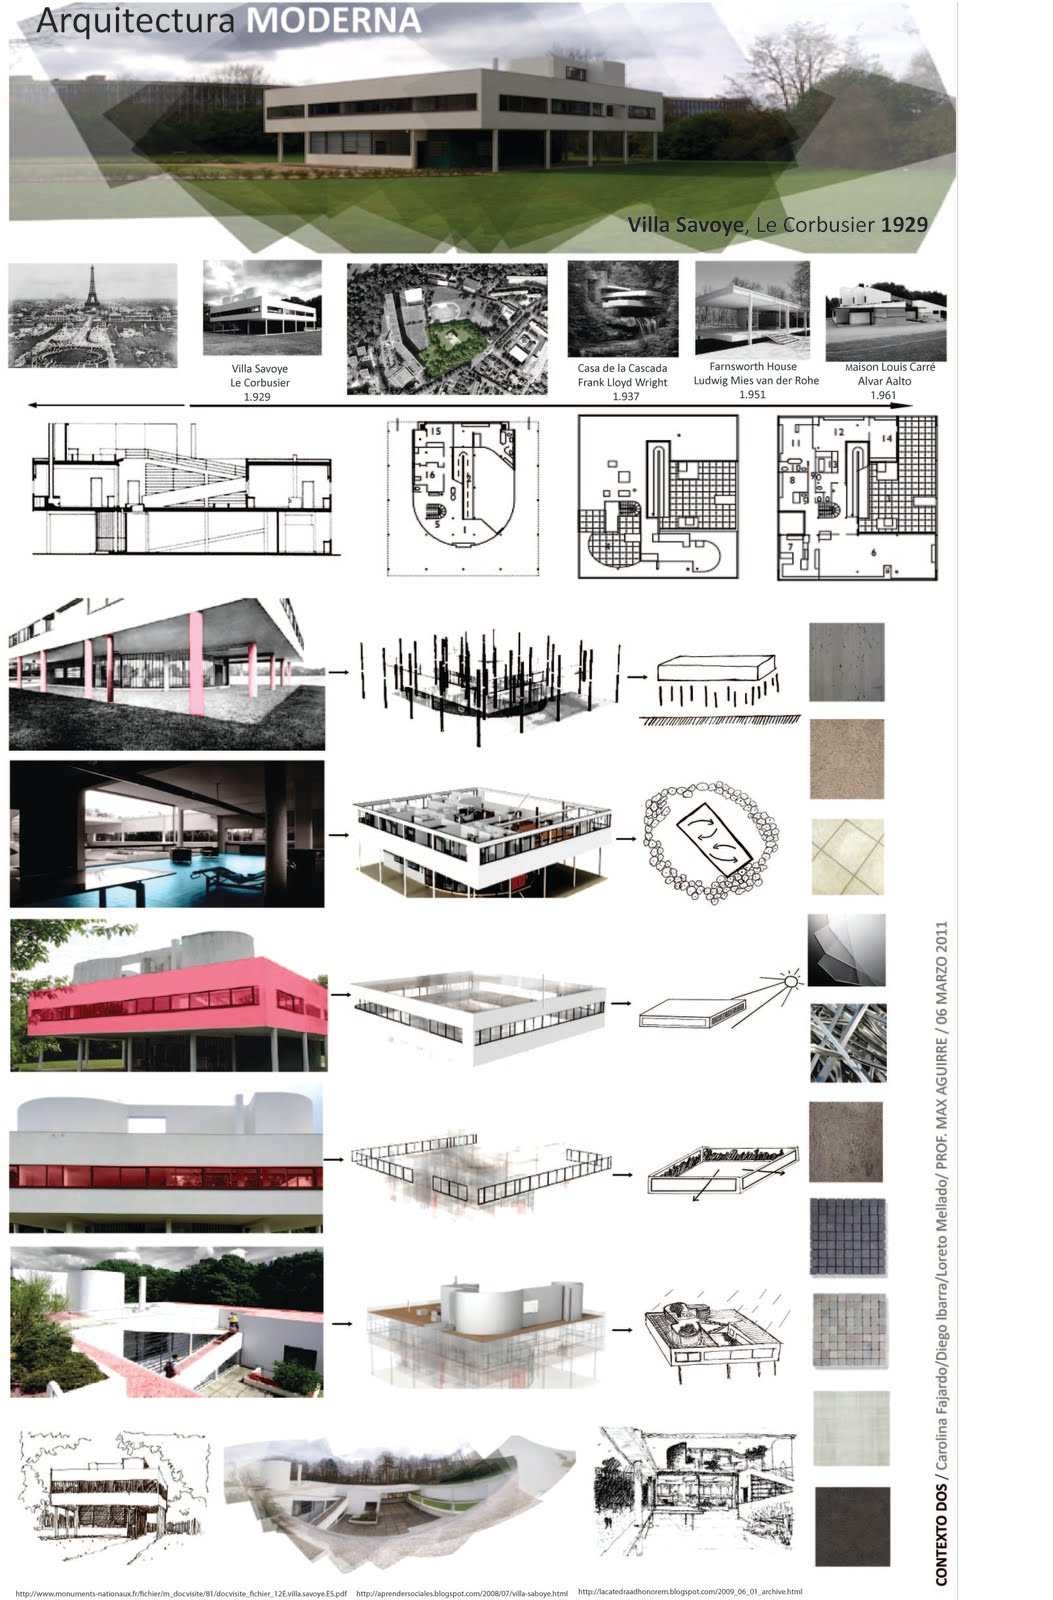 Historia De La Arquitectura Arquitectura Moderna Entrega